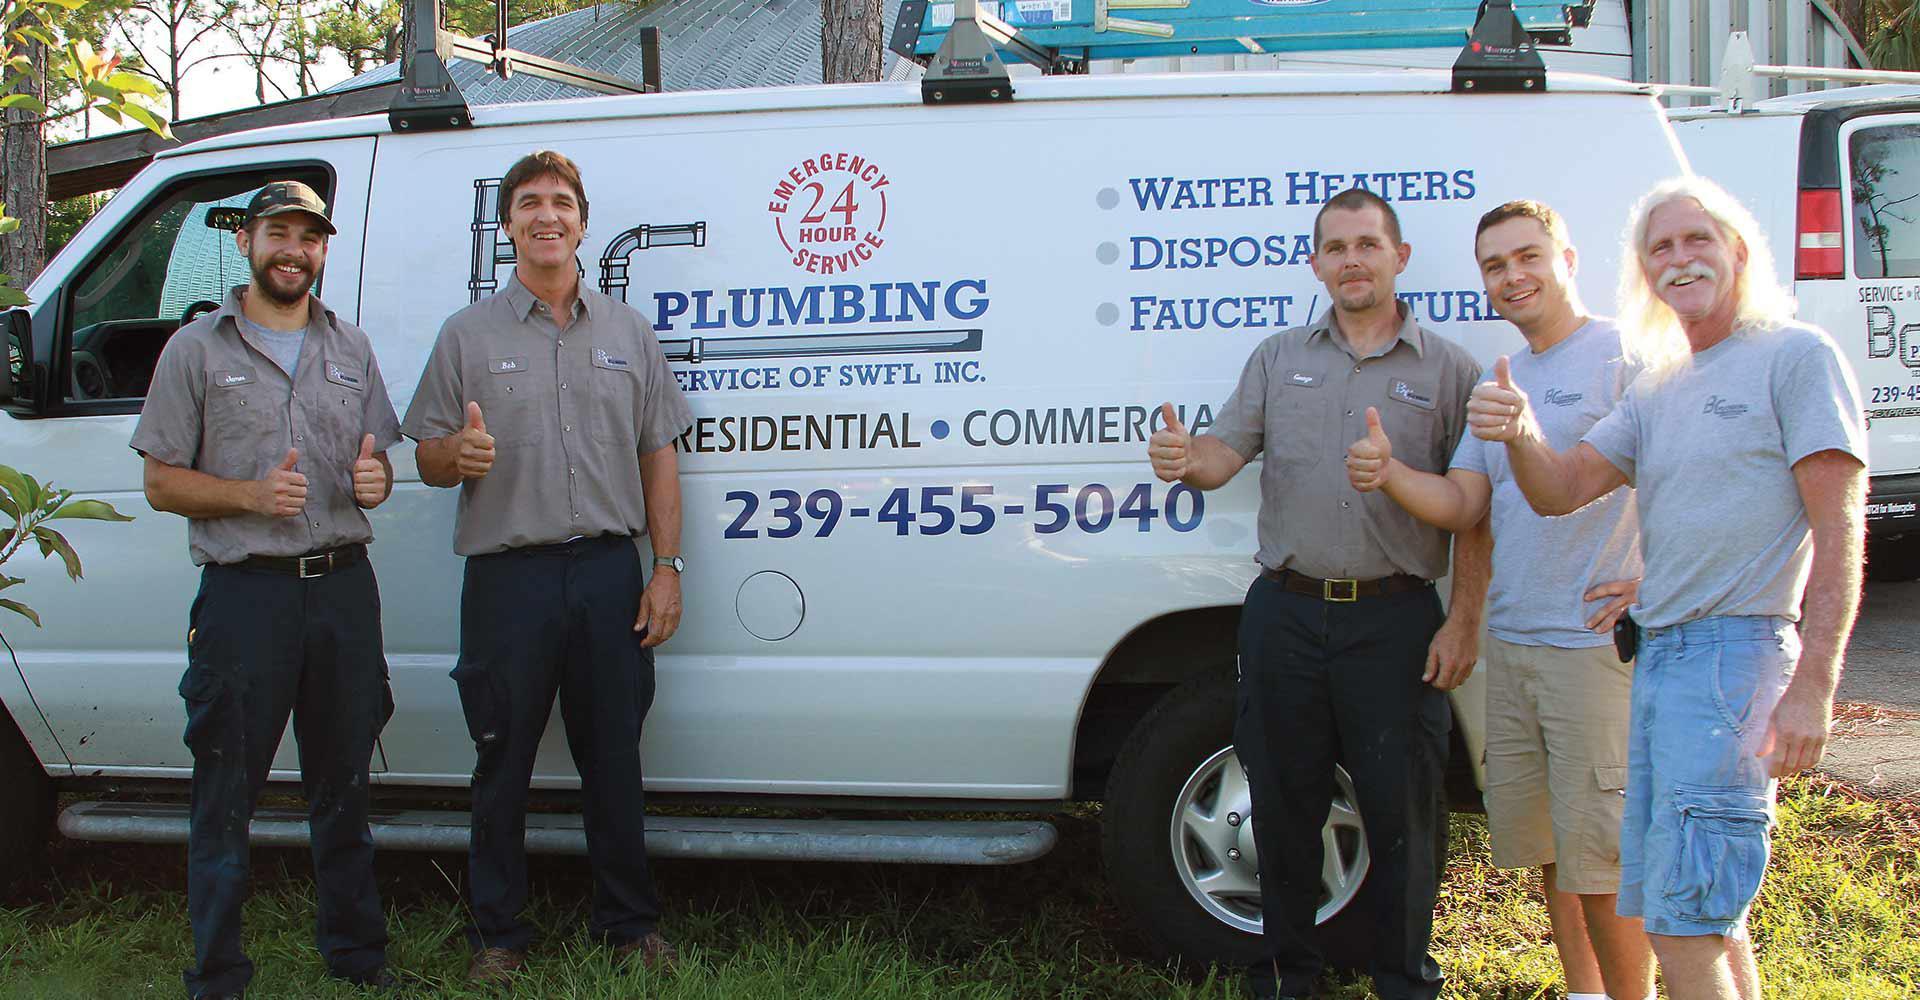 B C Plumbing Service Of SWFL Inc. image 1